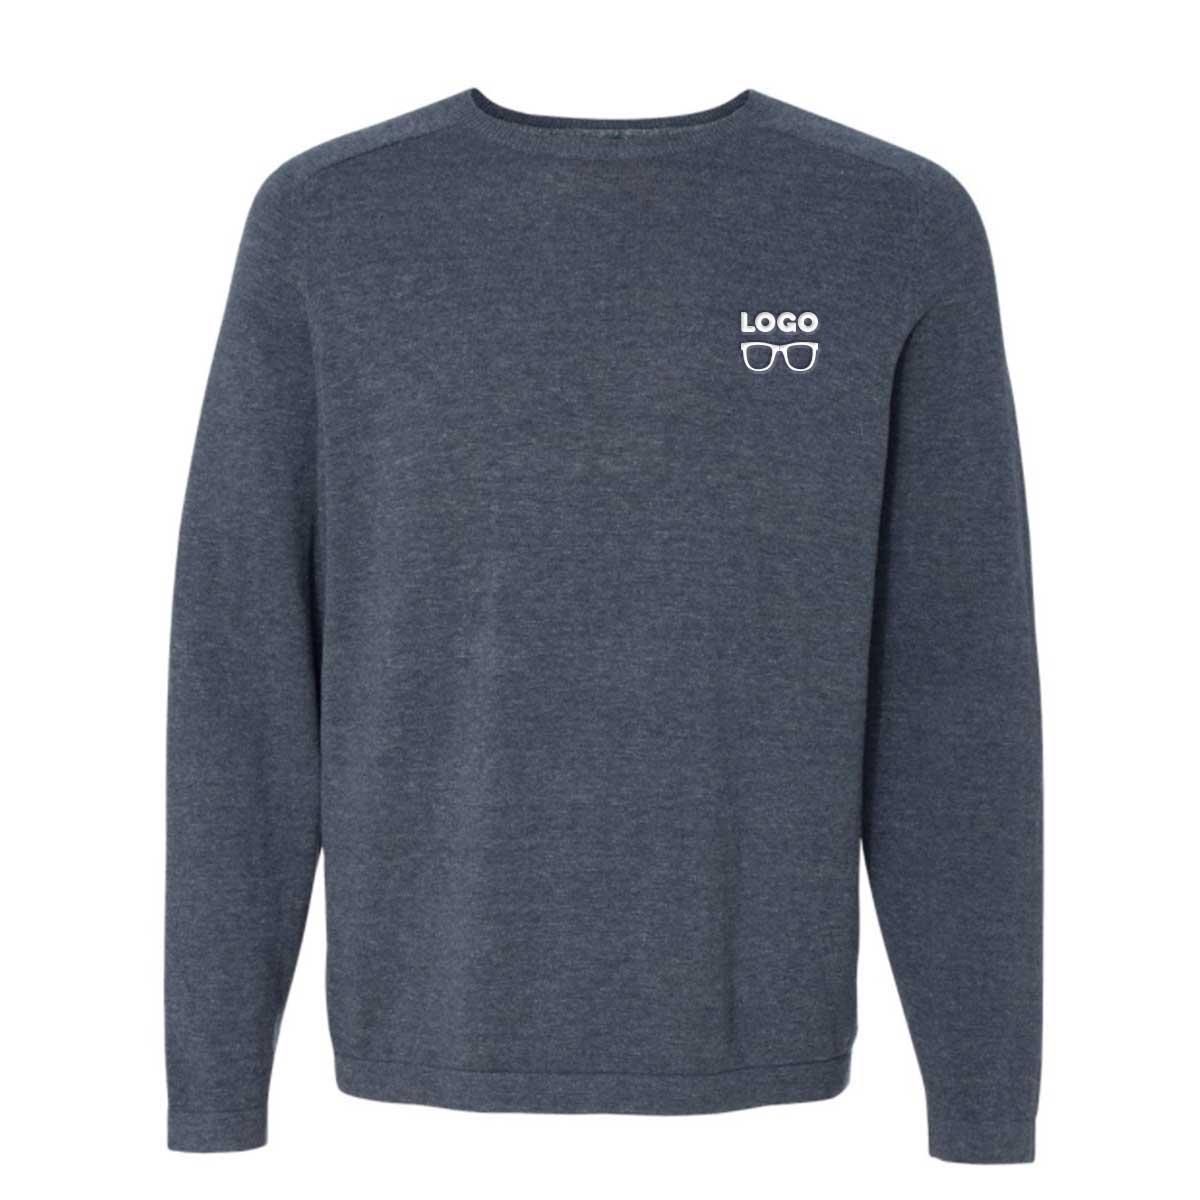 Brilliant crewneckcottonsweater denim